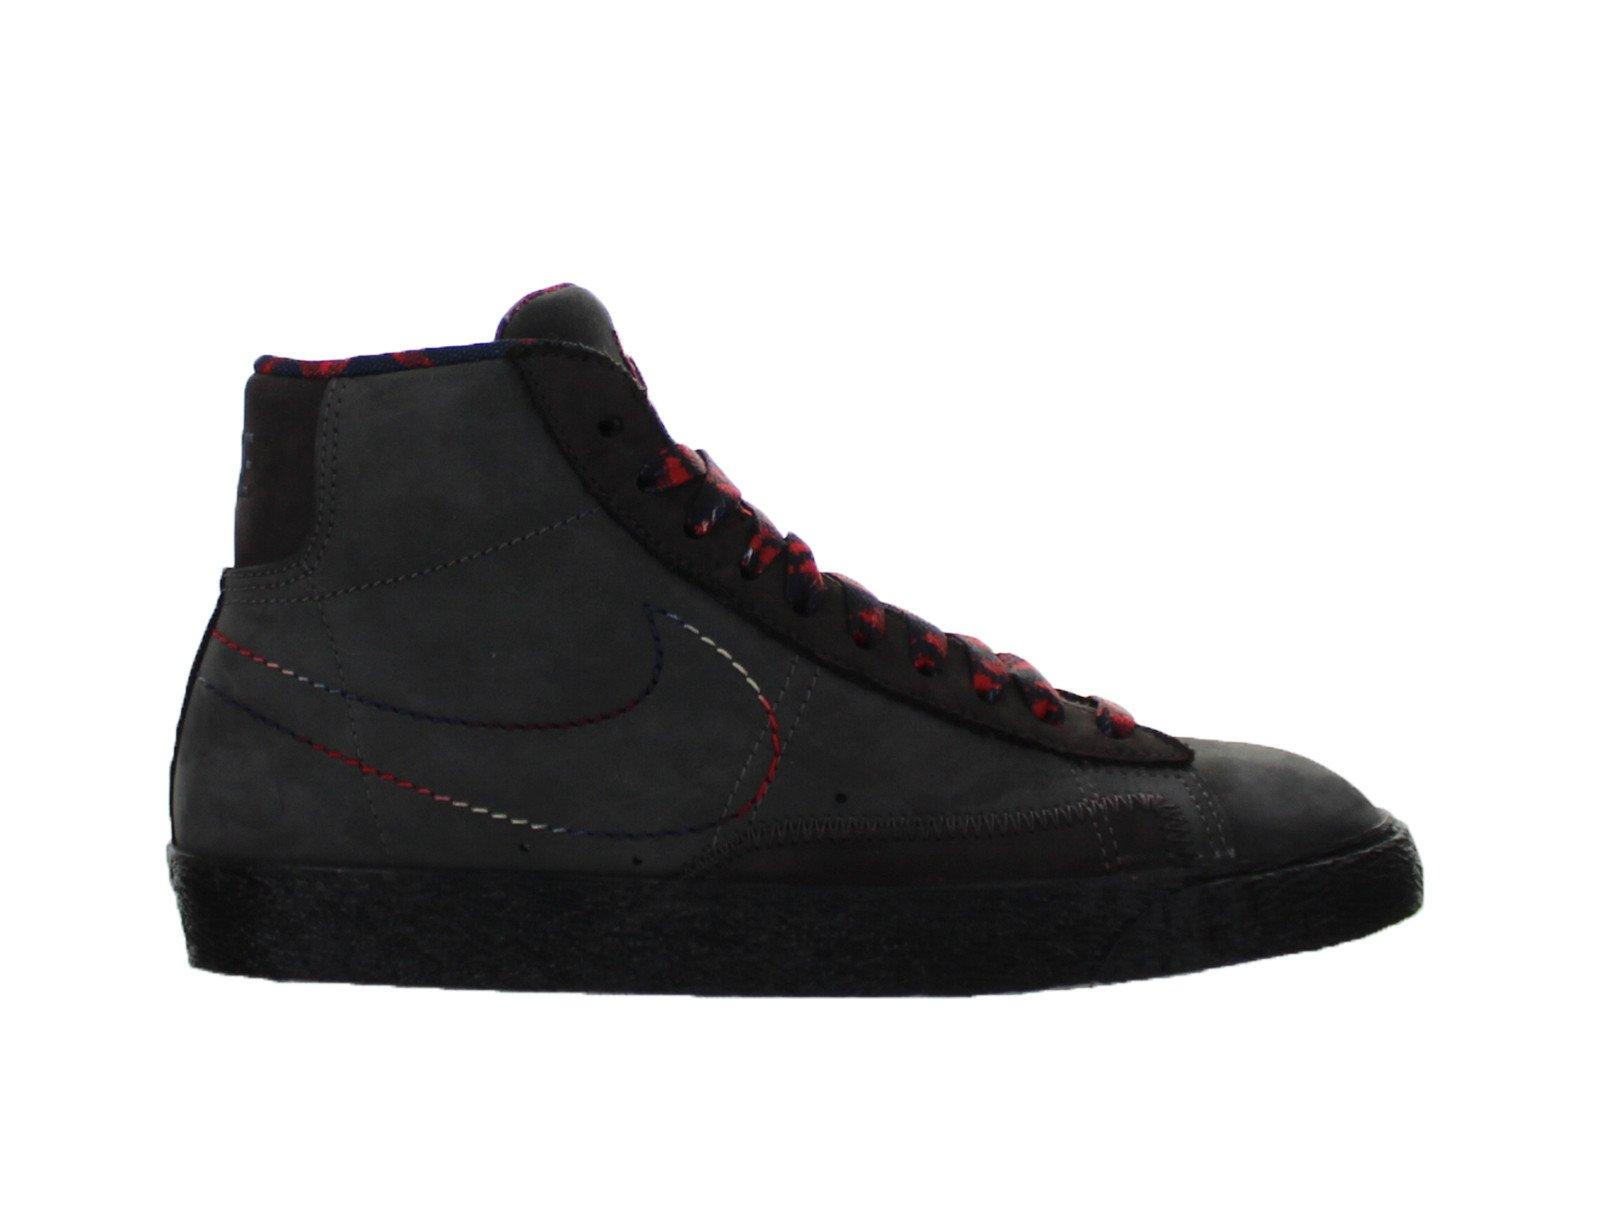 Womens Nike Blazer Mid Black History Month Midnight Fog Black 521300 ... 60f7eaa0a